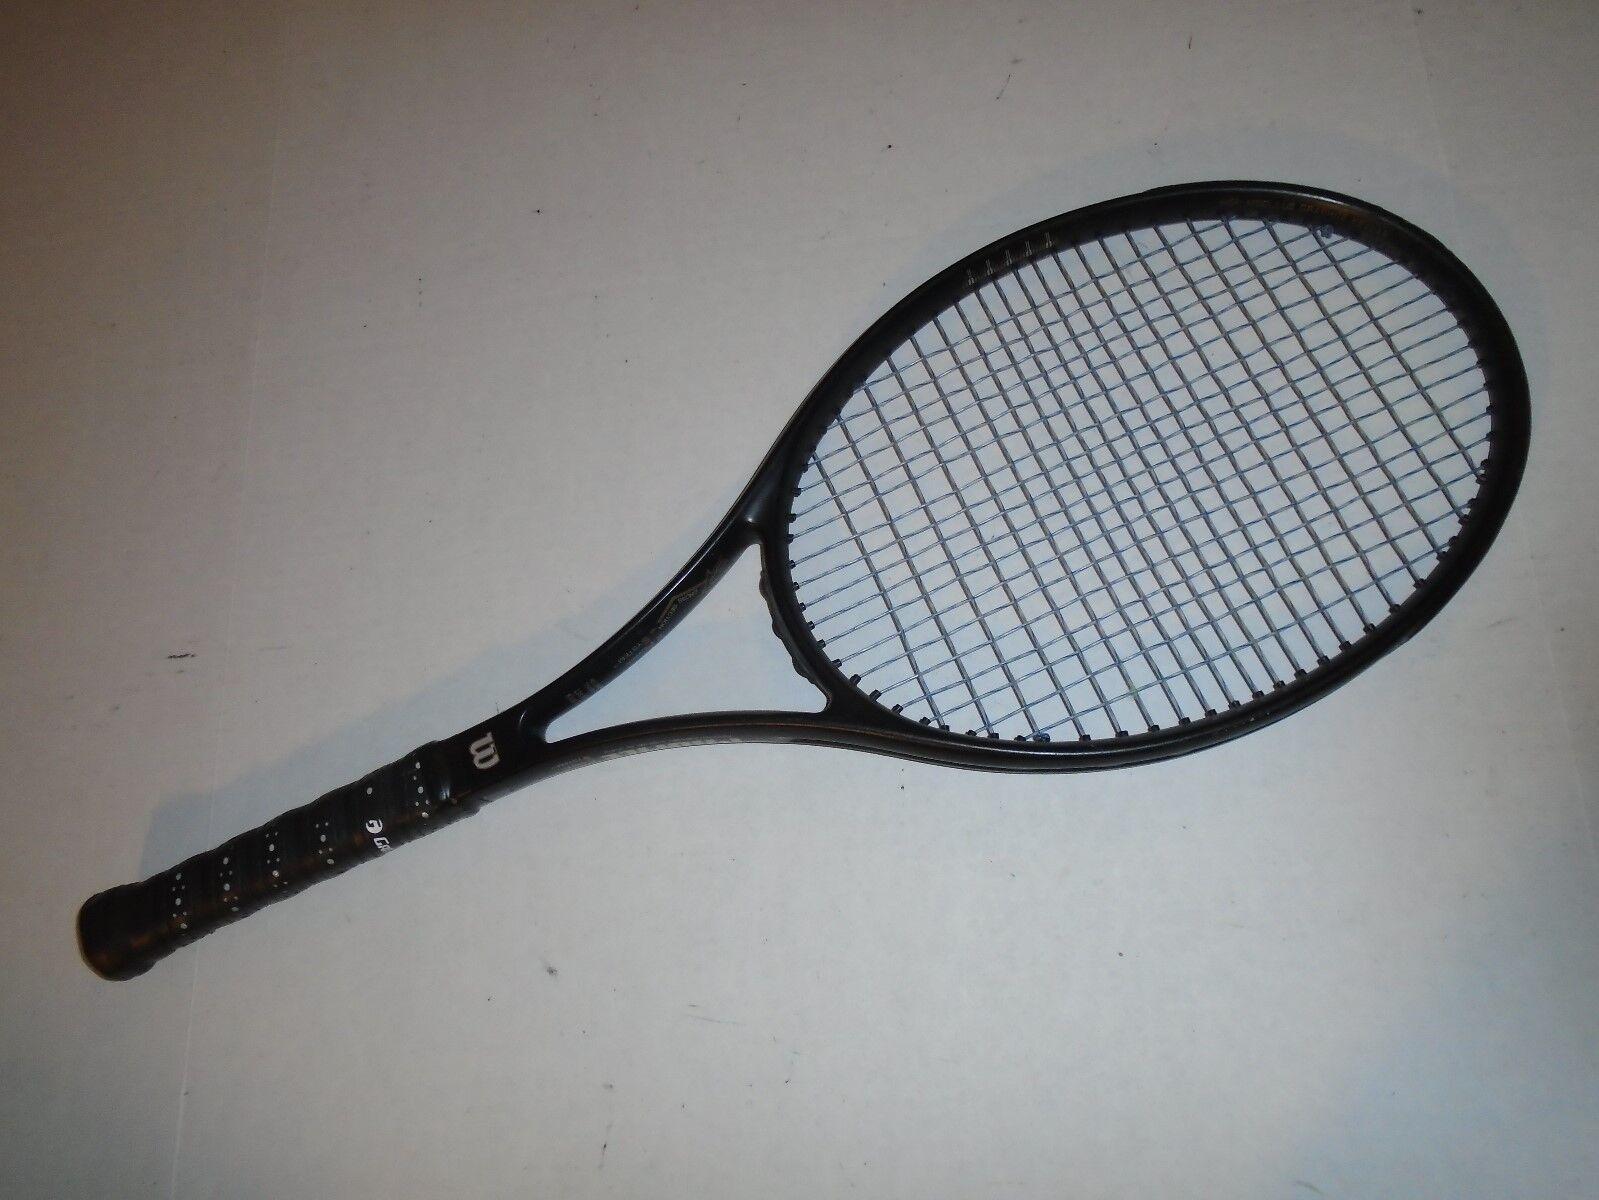 1993 Wilson Profile SPS 95 Tennis Racquet. 4 1 8. 9.65 oz. VG.